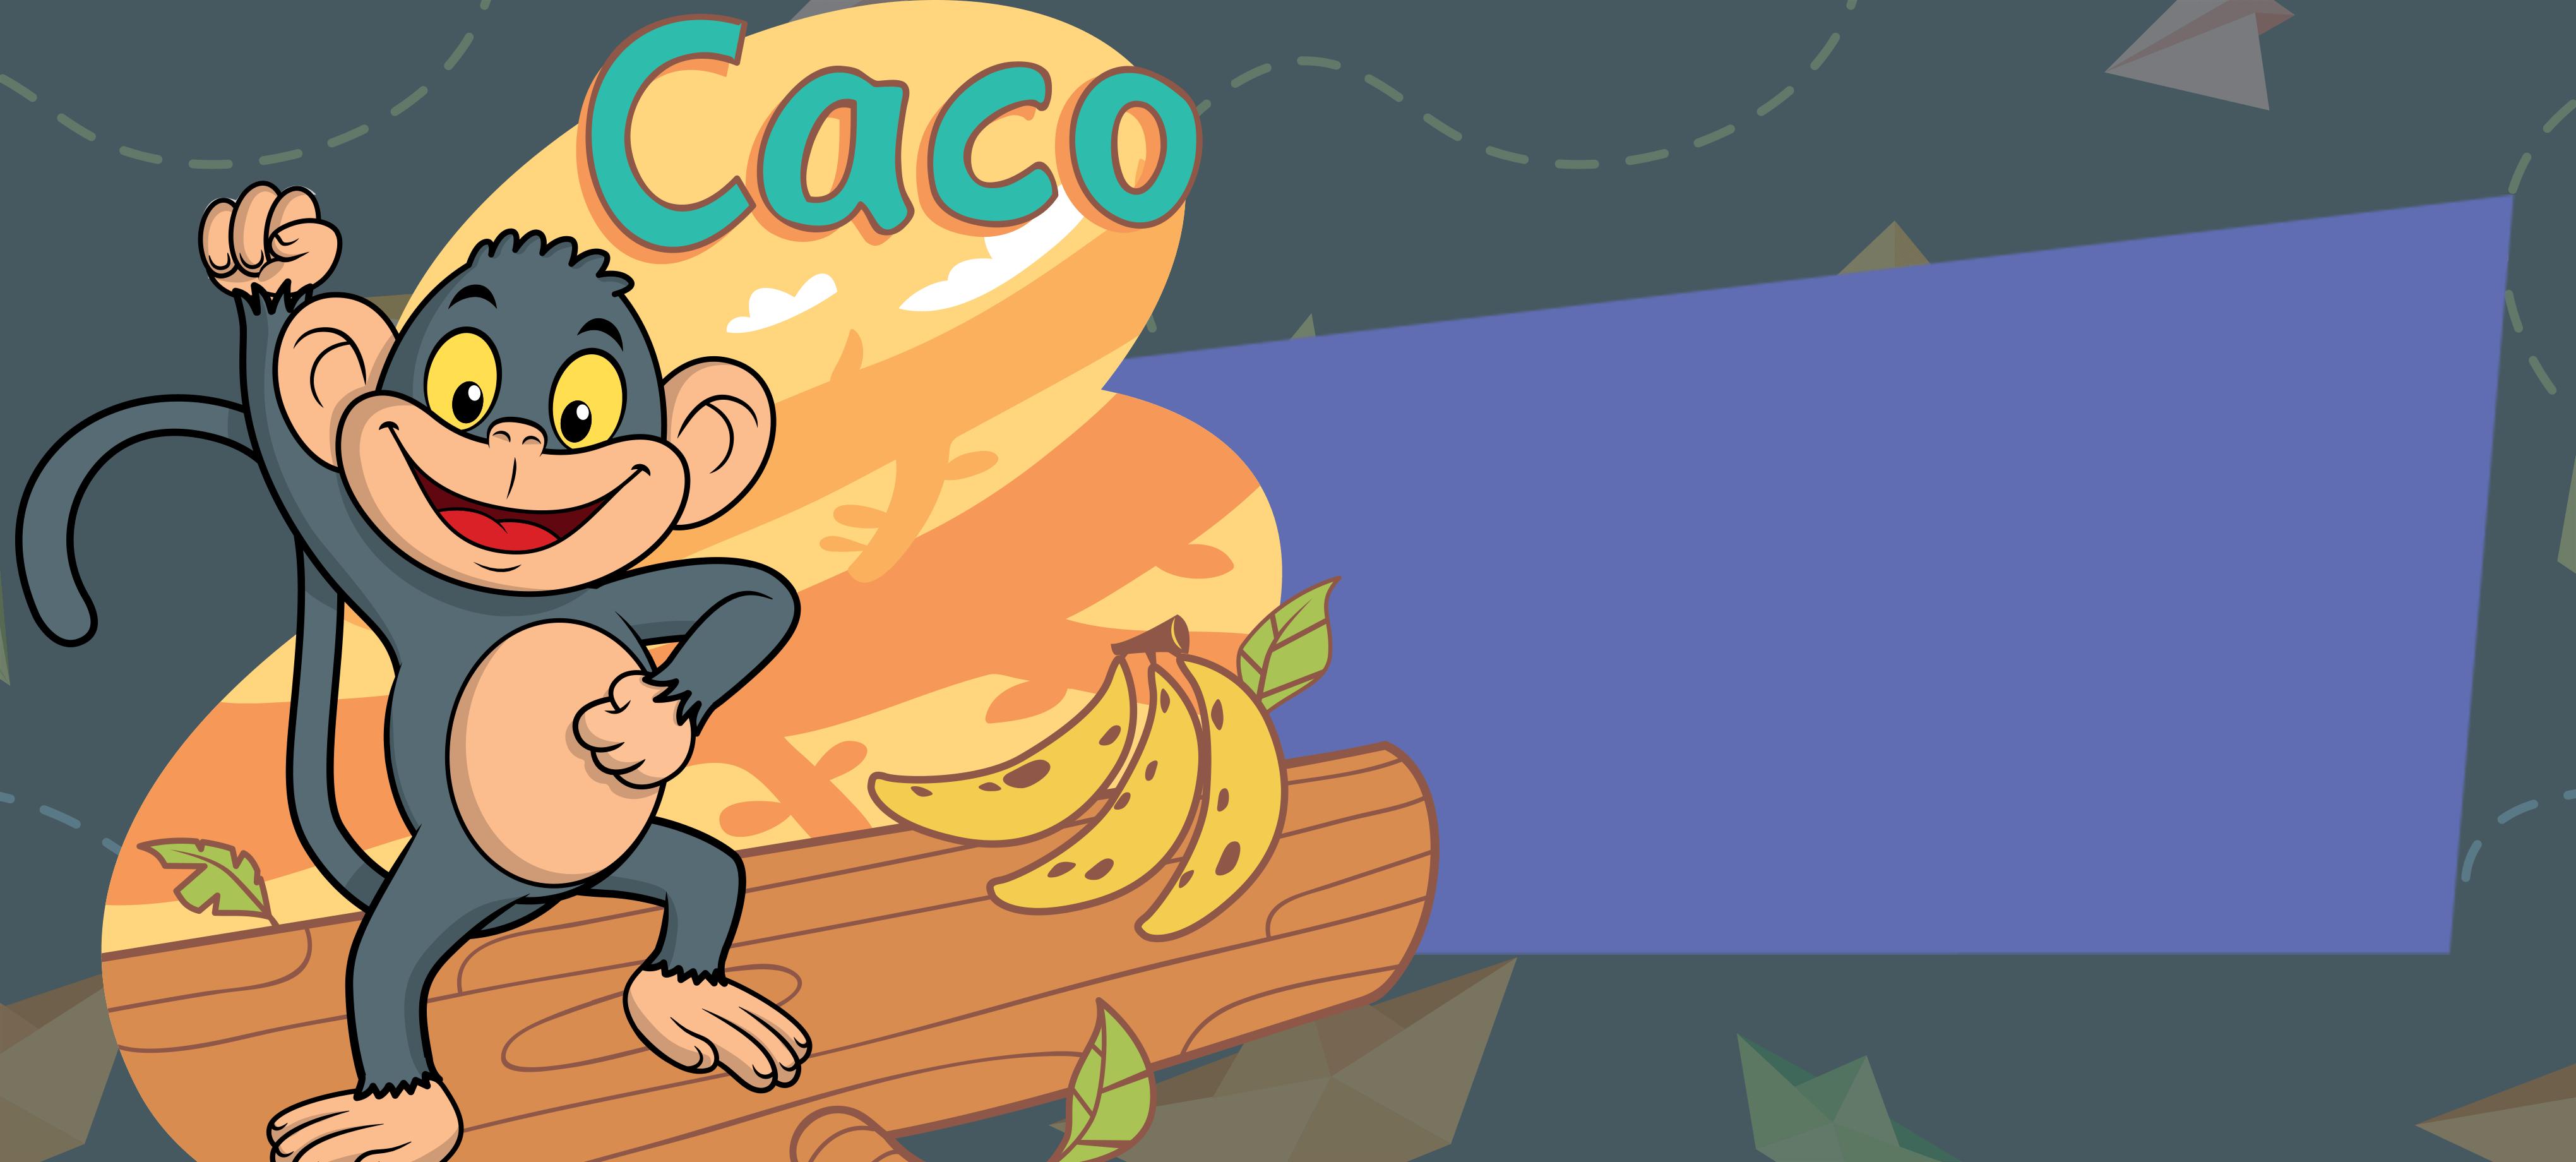 banner-qm-caco